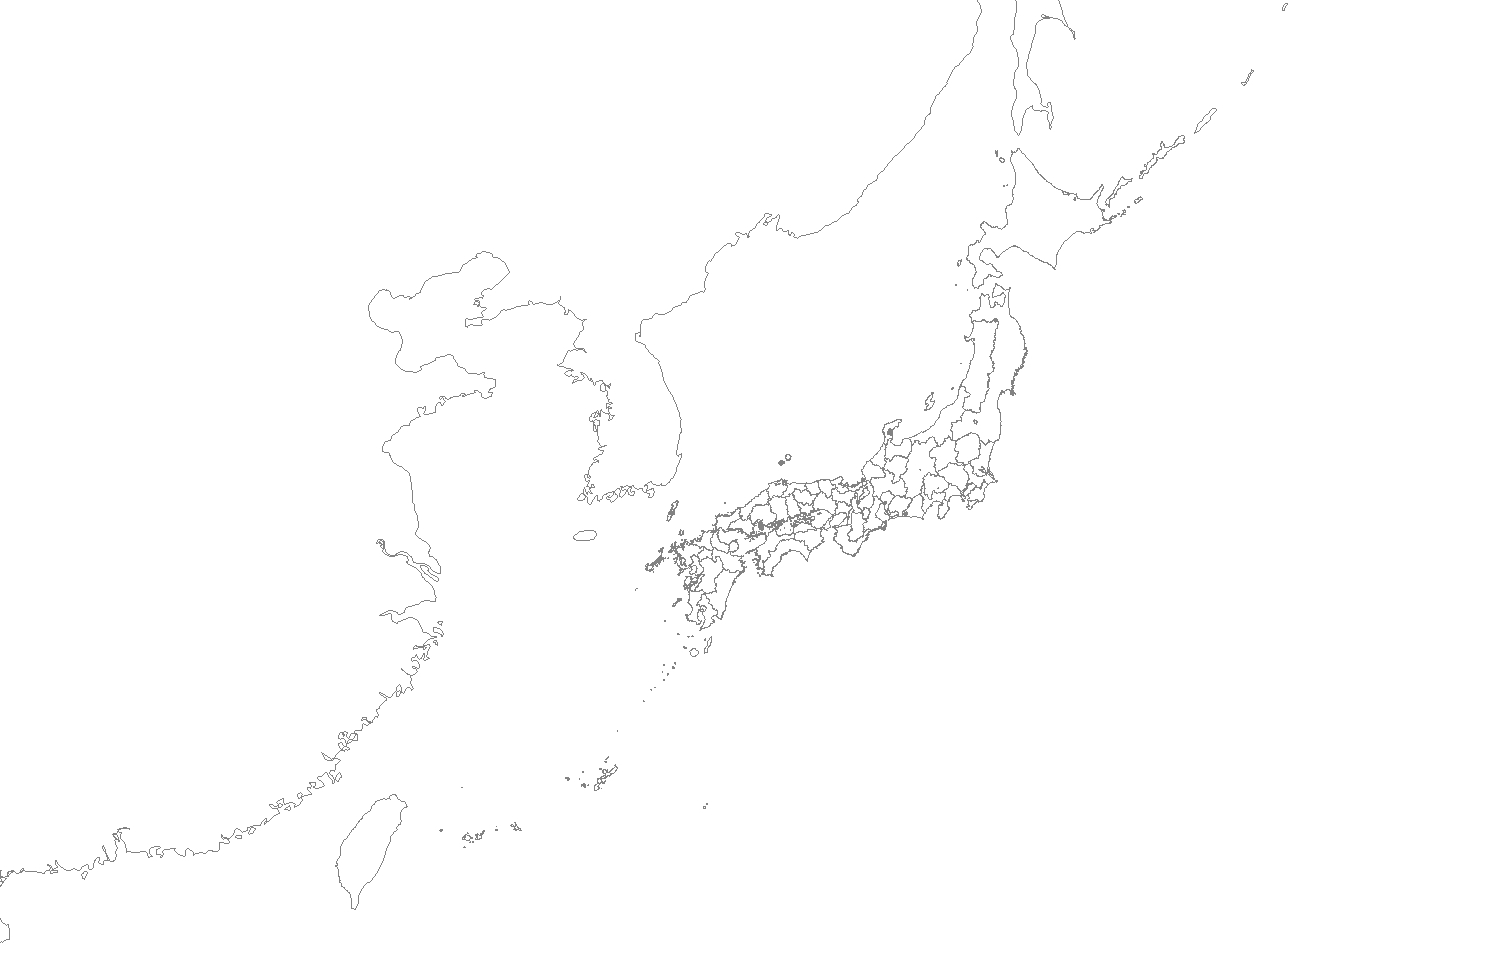 Reproduced from www.cc.okayama-u.ac.jp